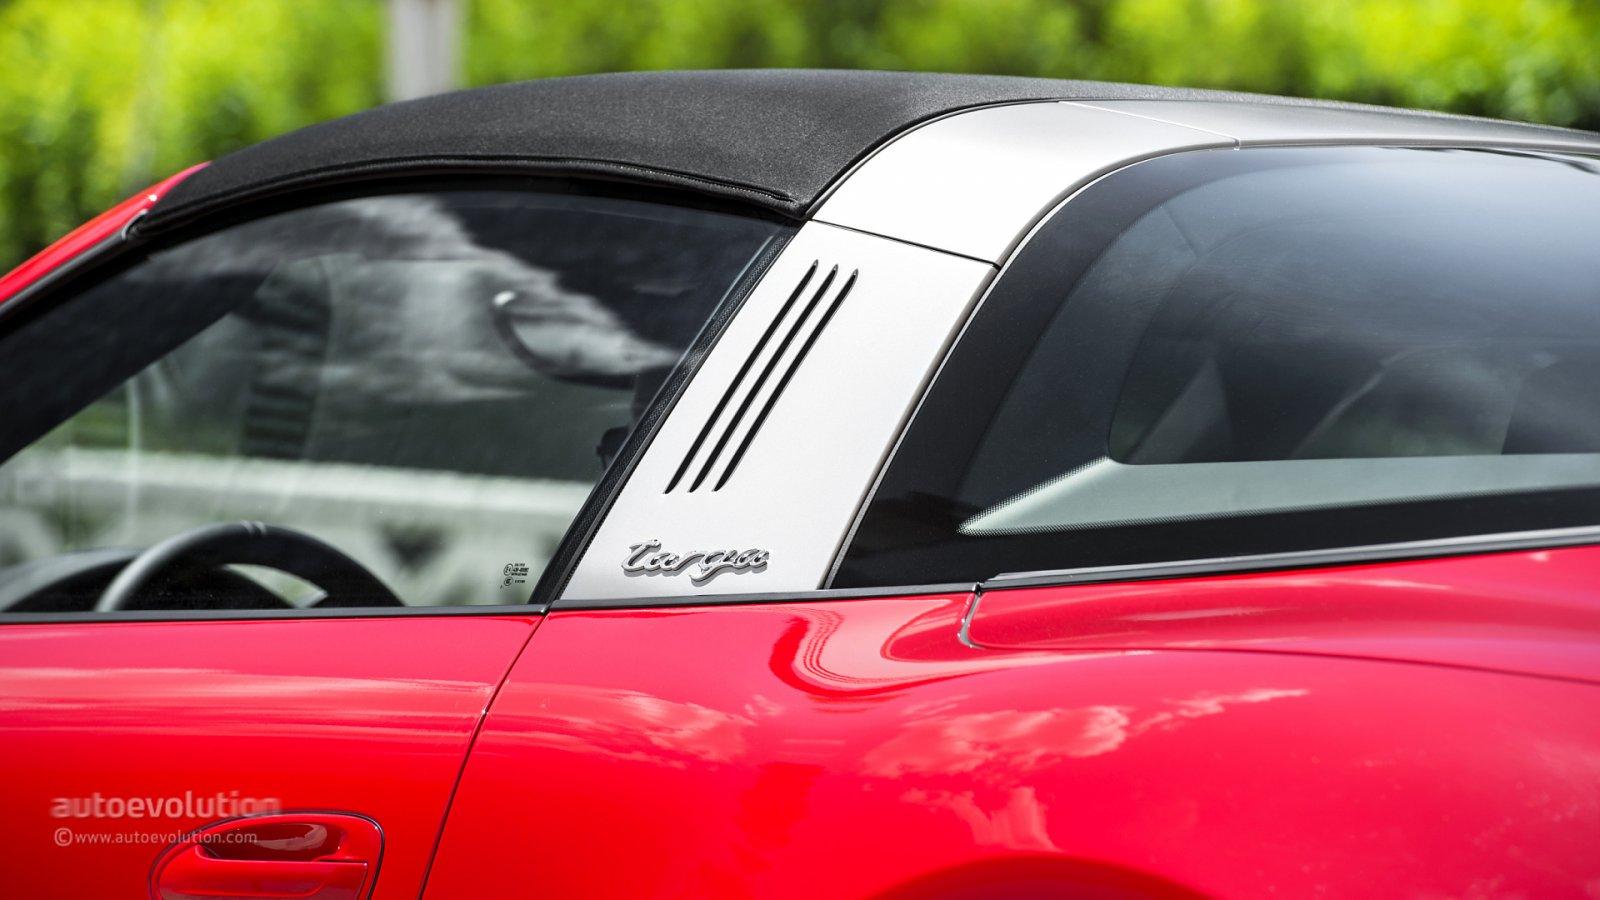 porsche-911-targa-review-2014_29.jpg